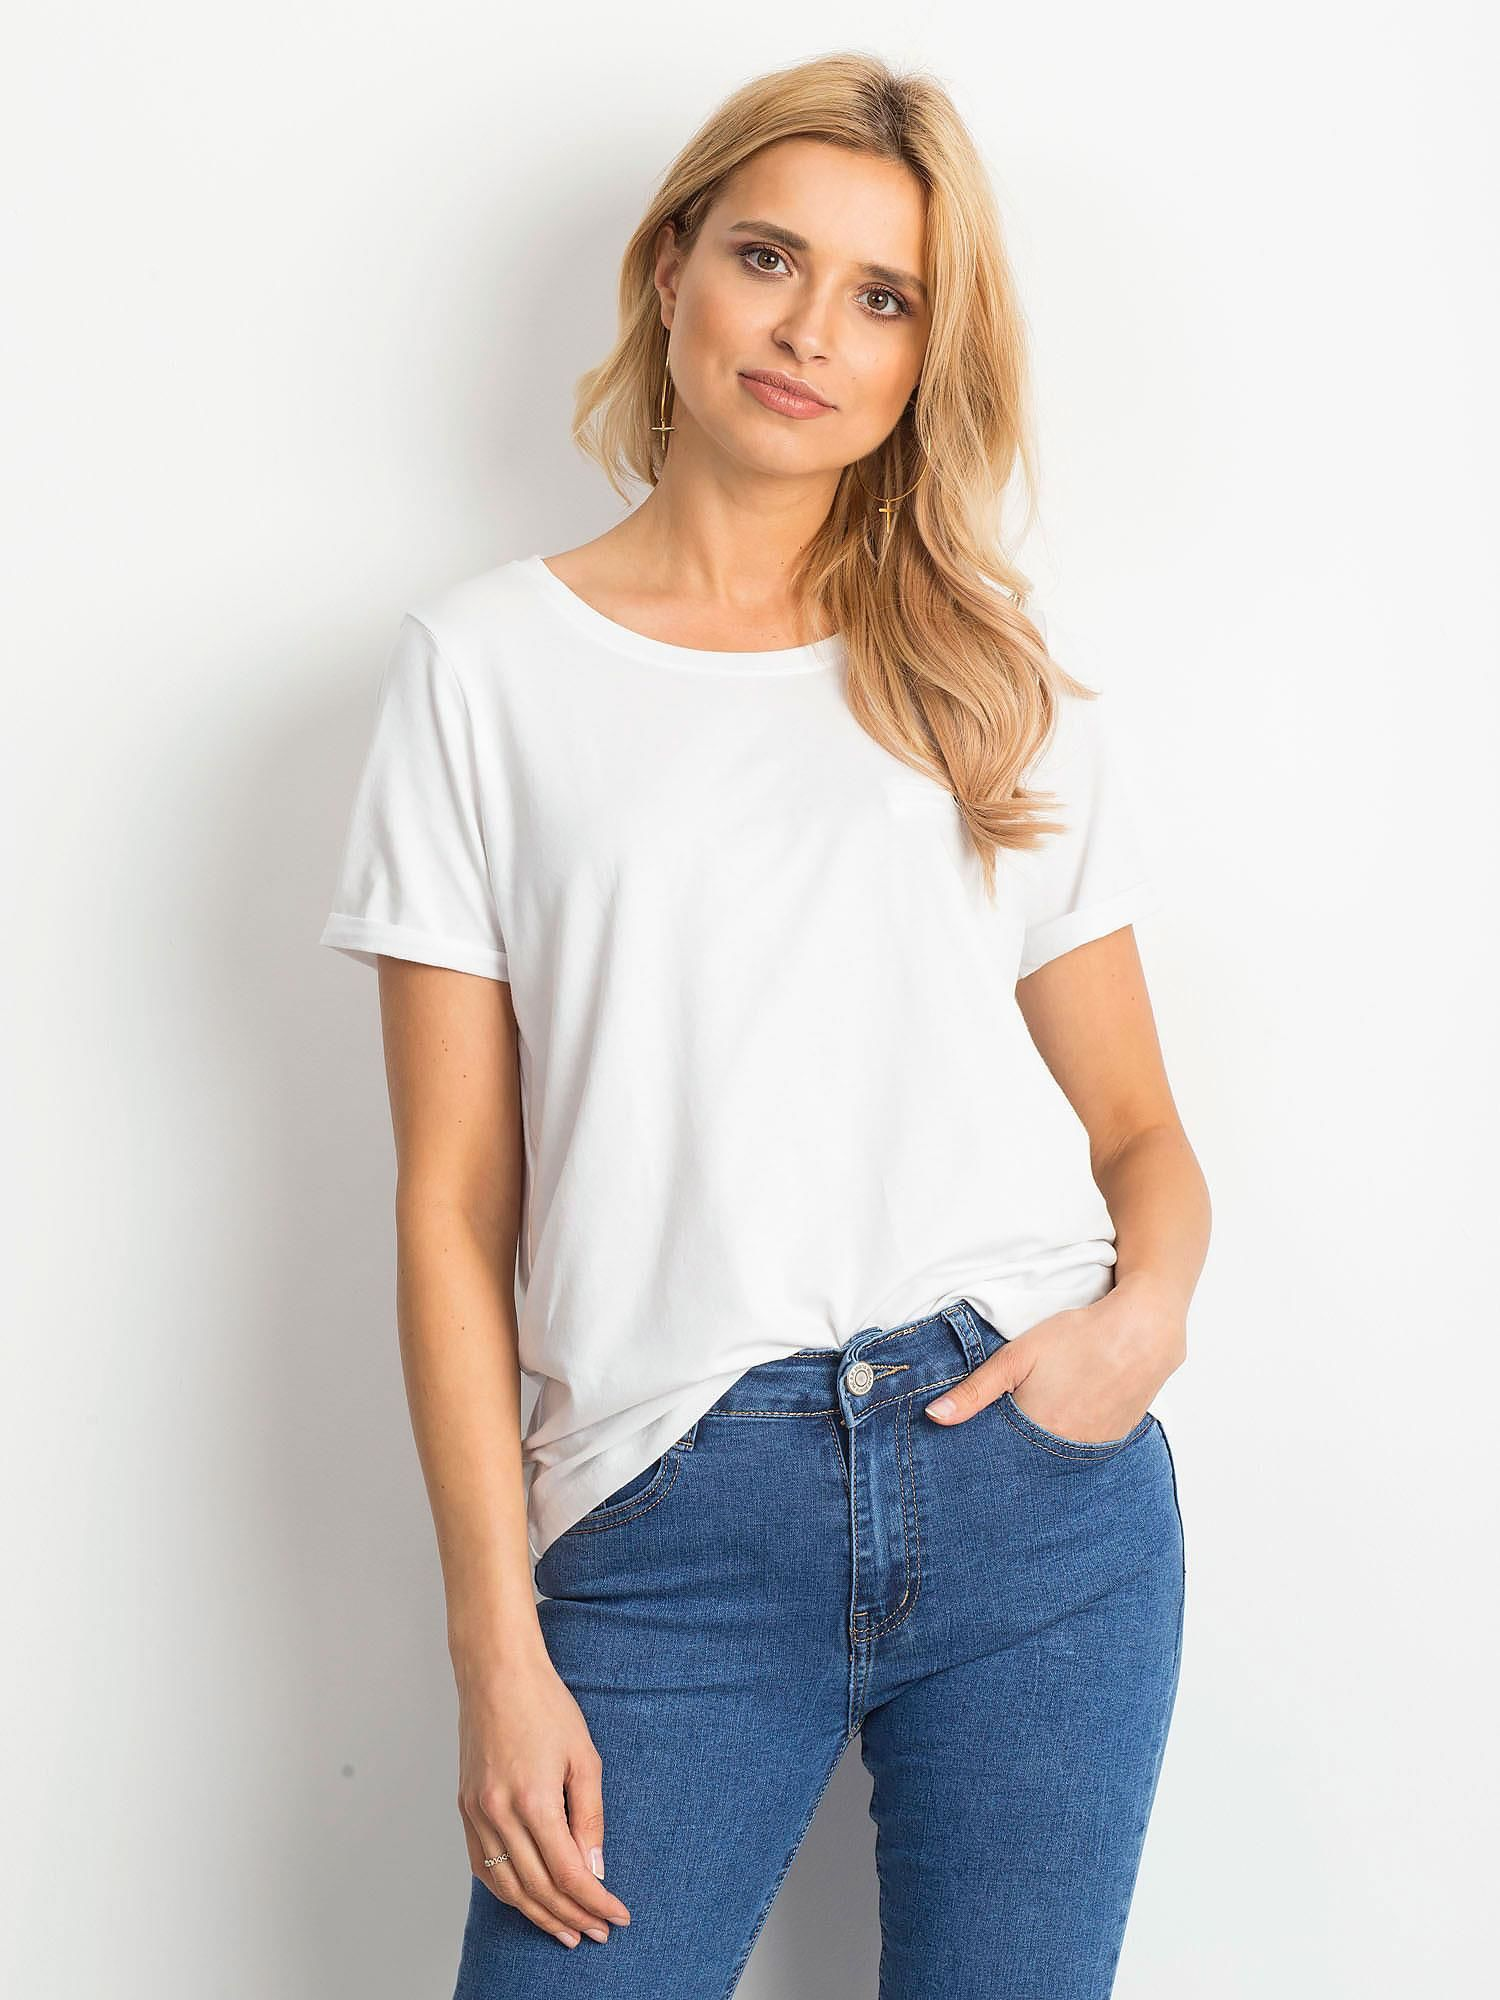 Dámske biele bavlnené tričko - XS